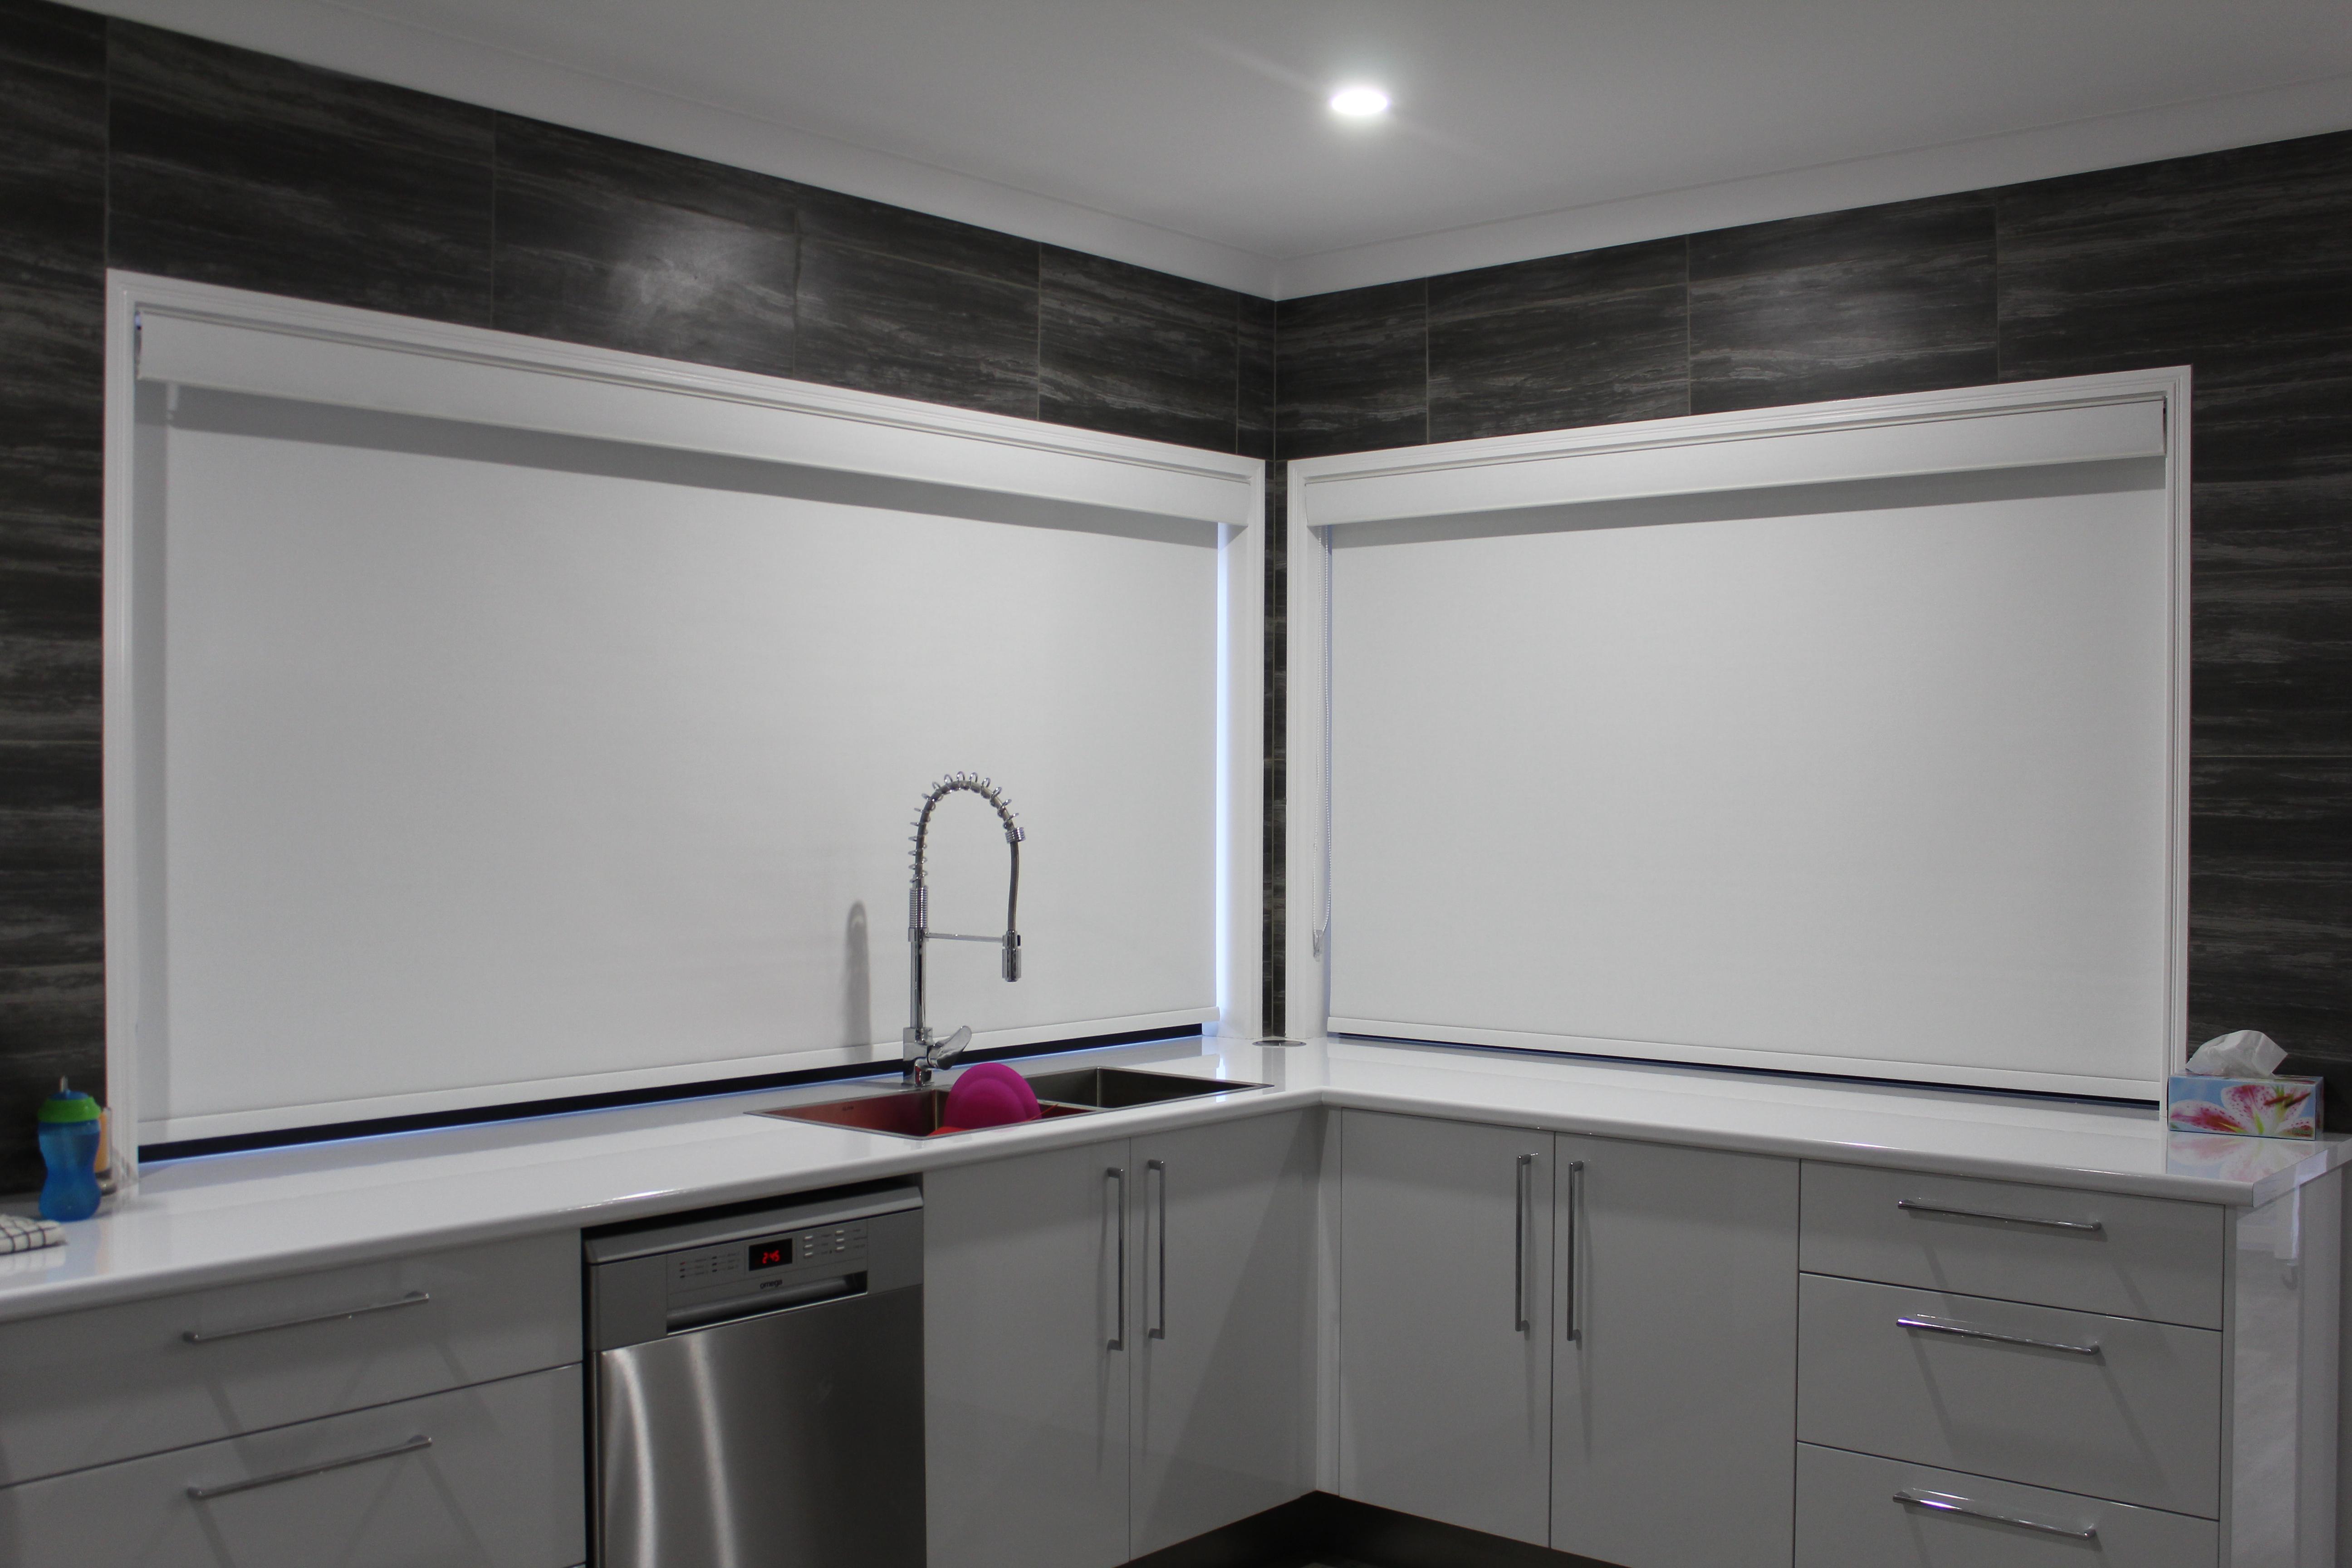 Franks home d cor centre internal blinds installation in hervey bay Home decorators blinds installation